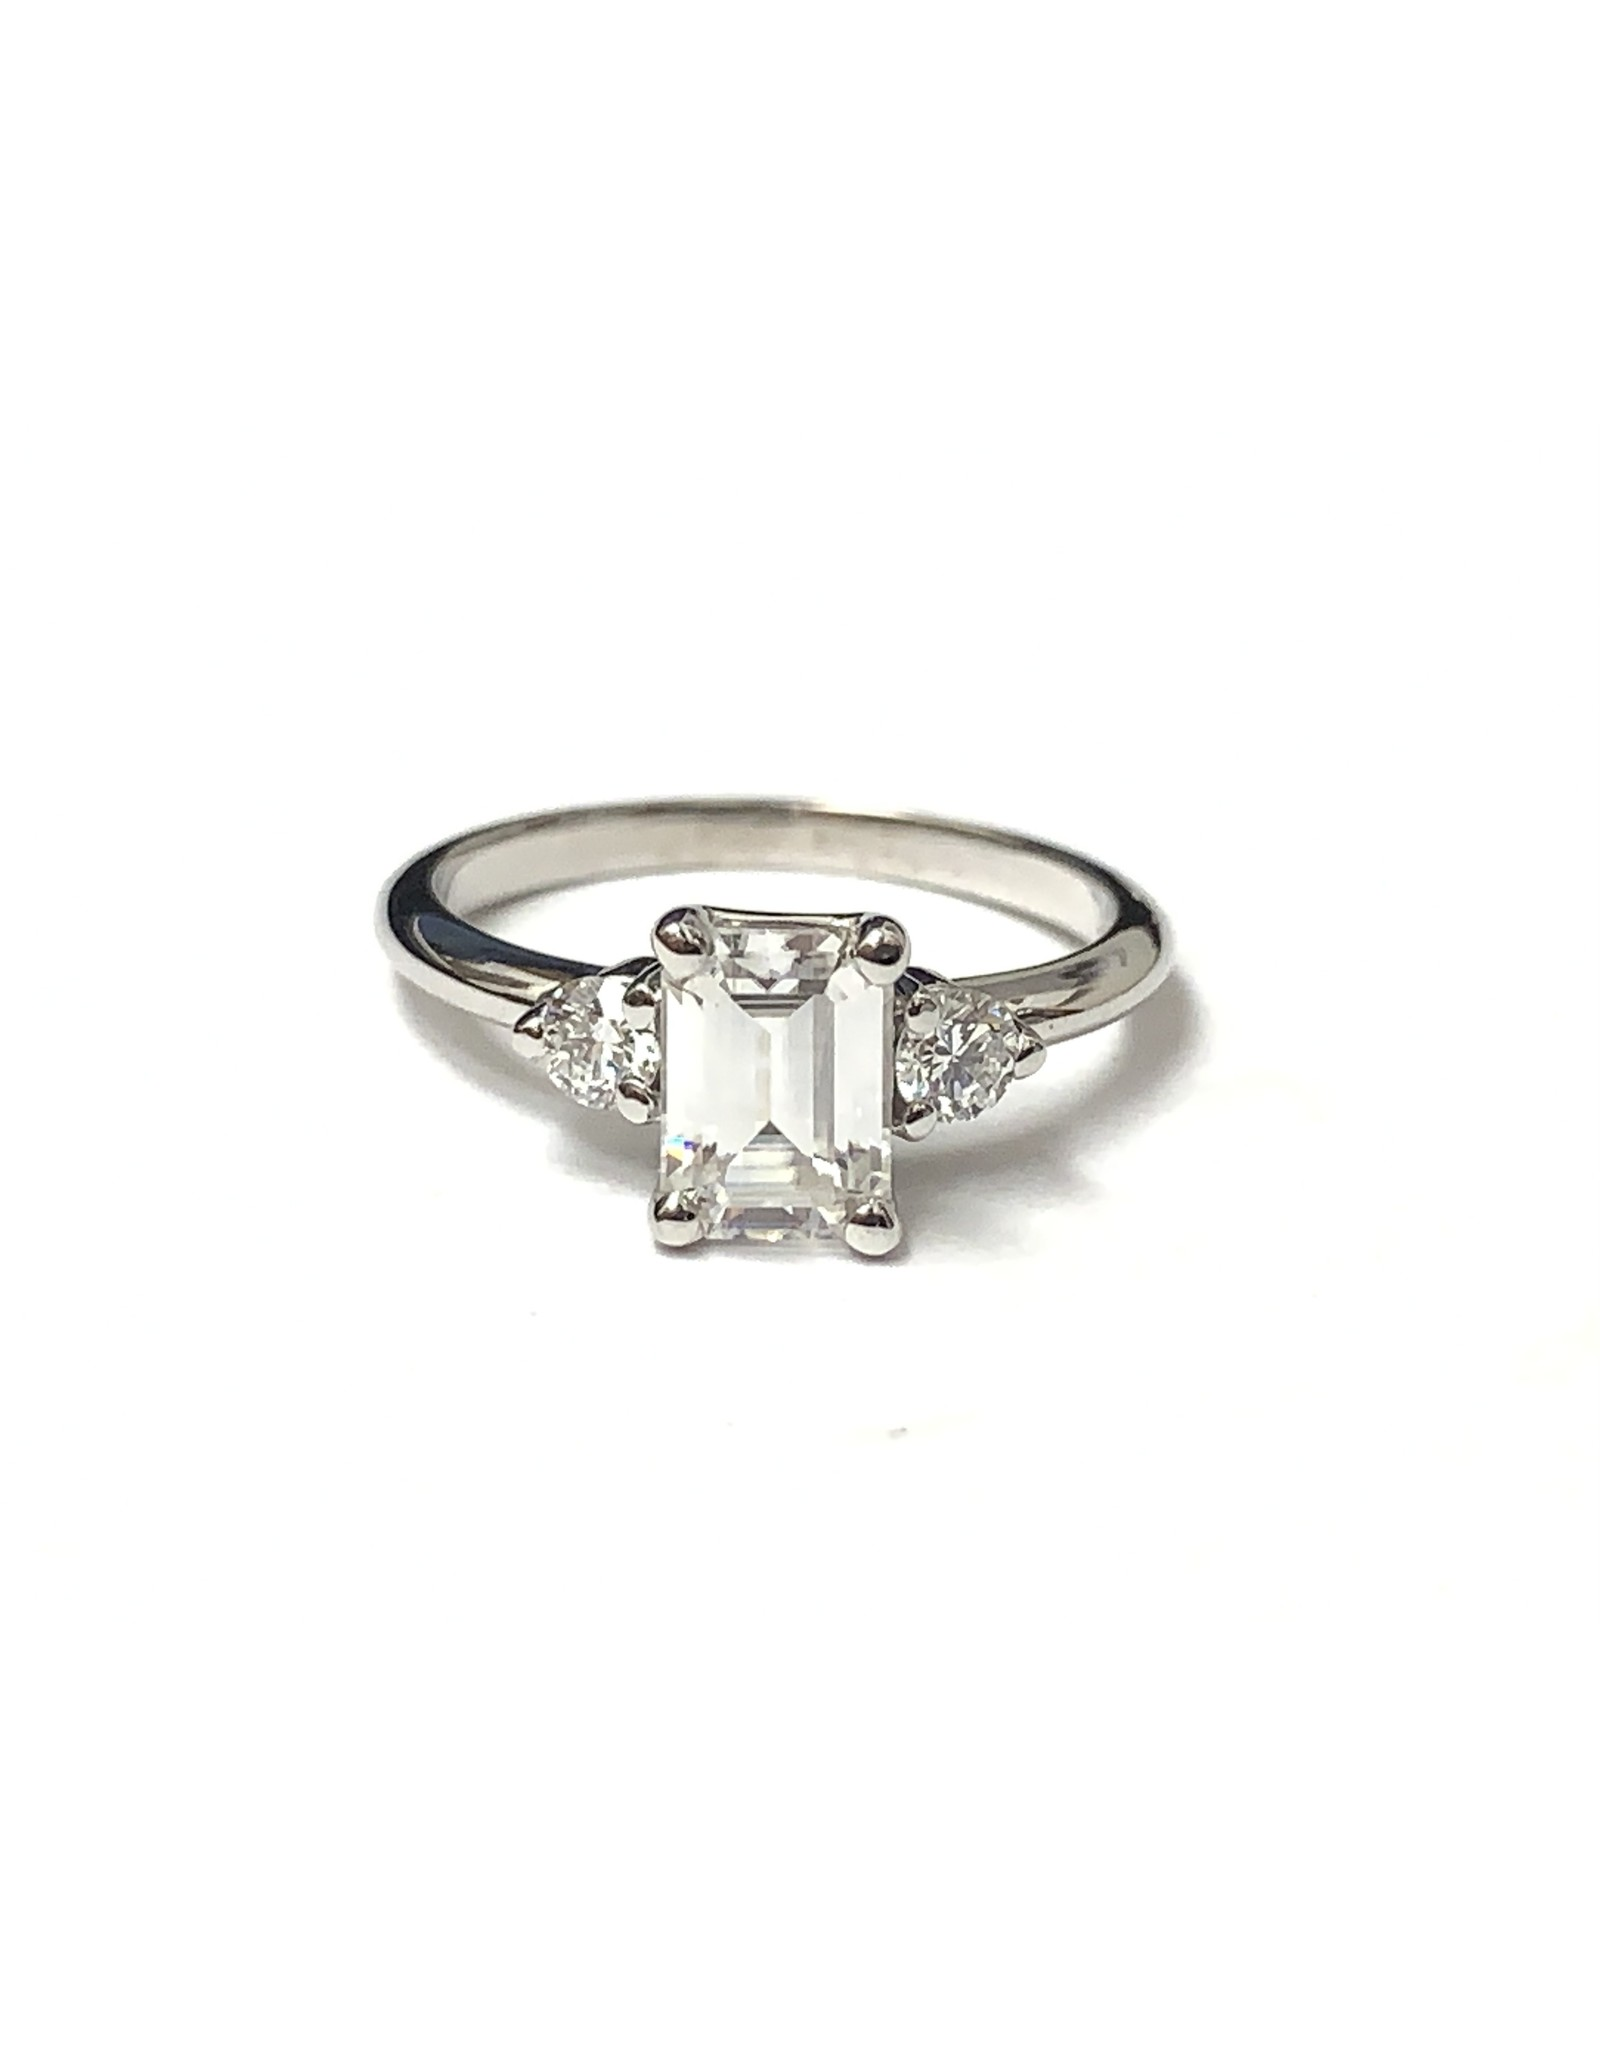 7x5mm Emerald Cut Moissanite & Lab Diamond Ring 14KW